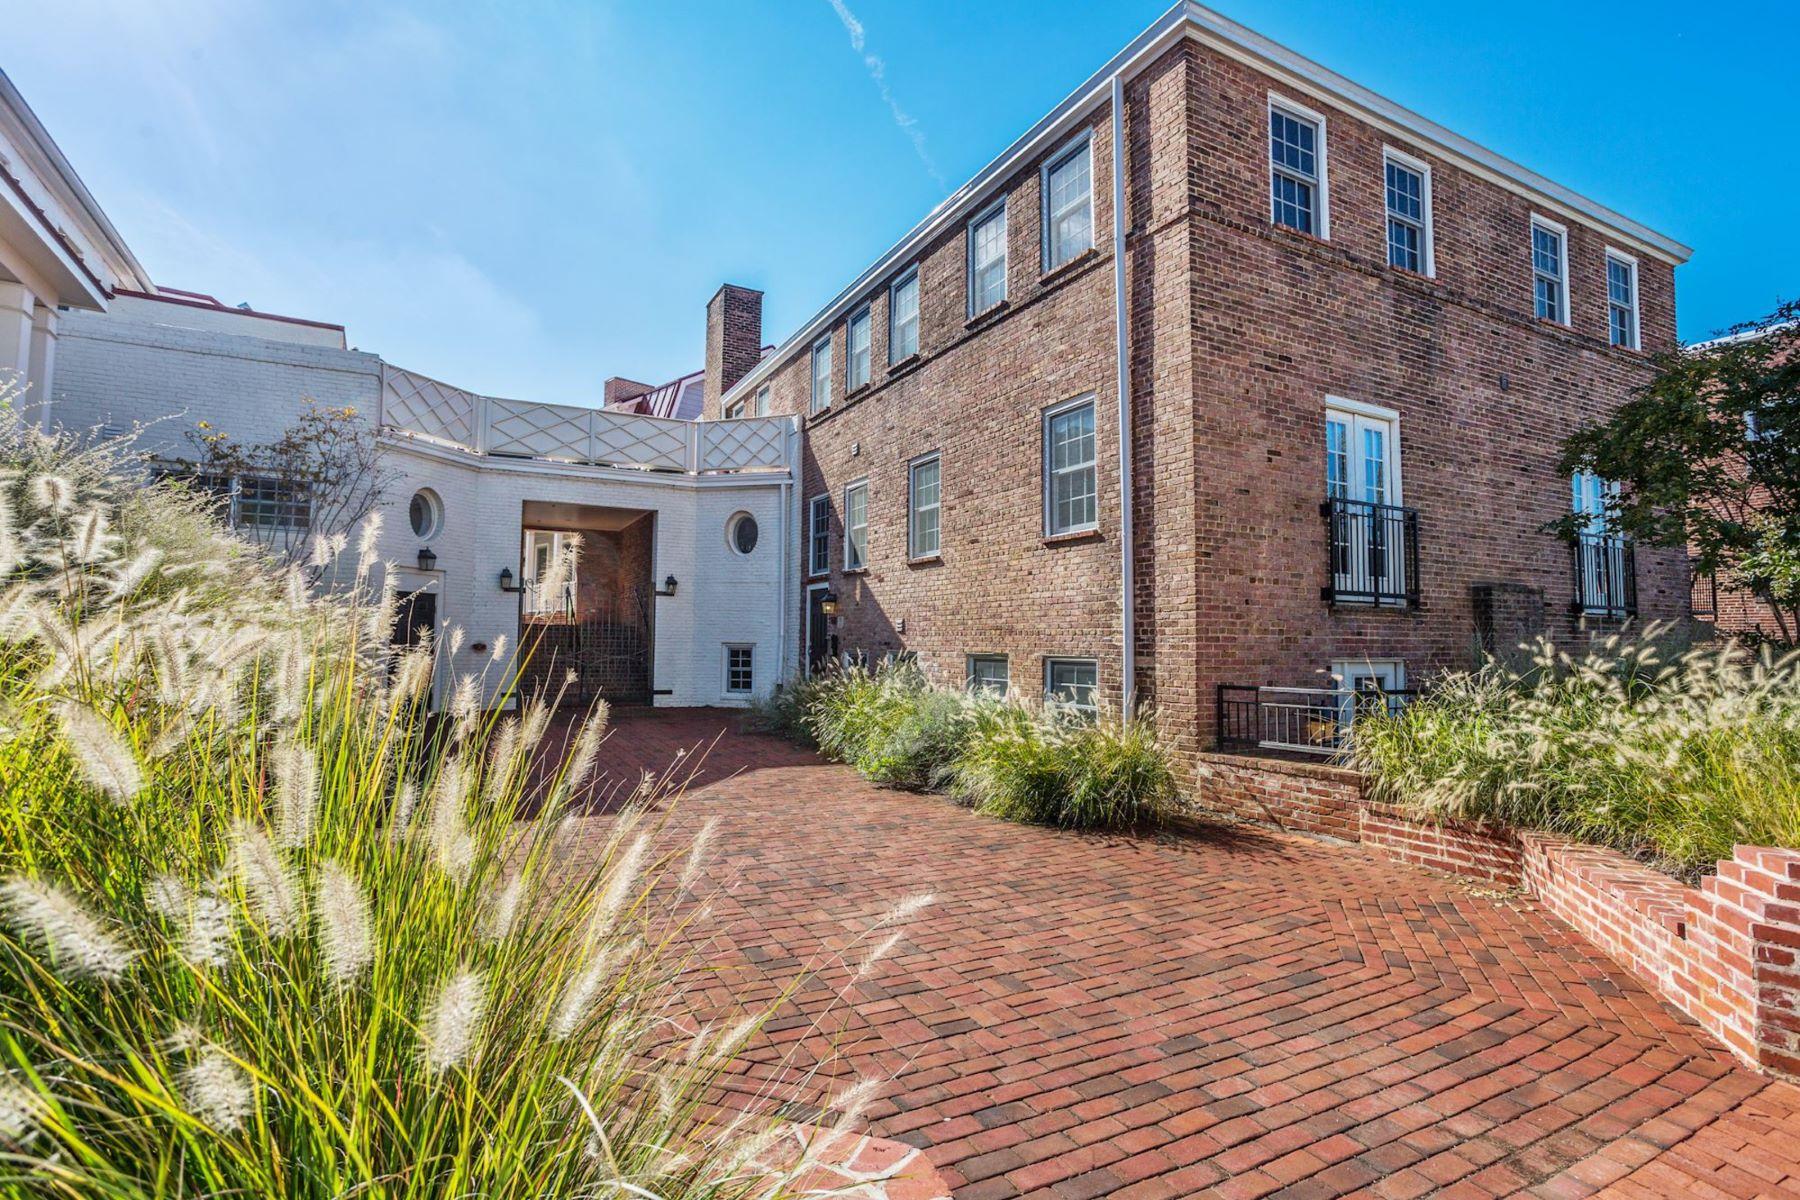 Property for Sale at 611 D St SE #4d 611 D St SE #4d Washington, District Of Columbia 20003 United States